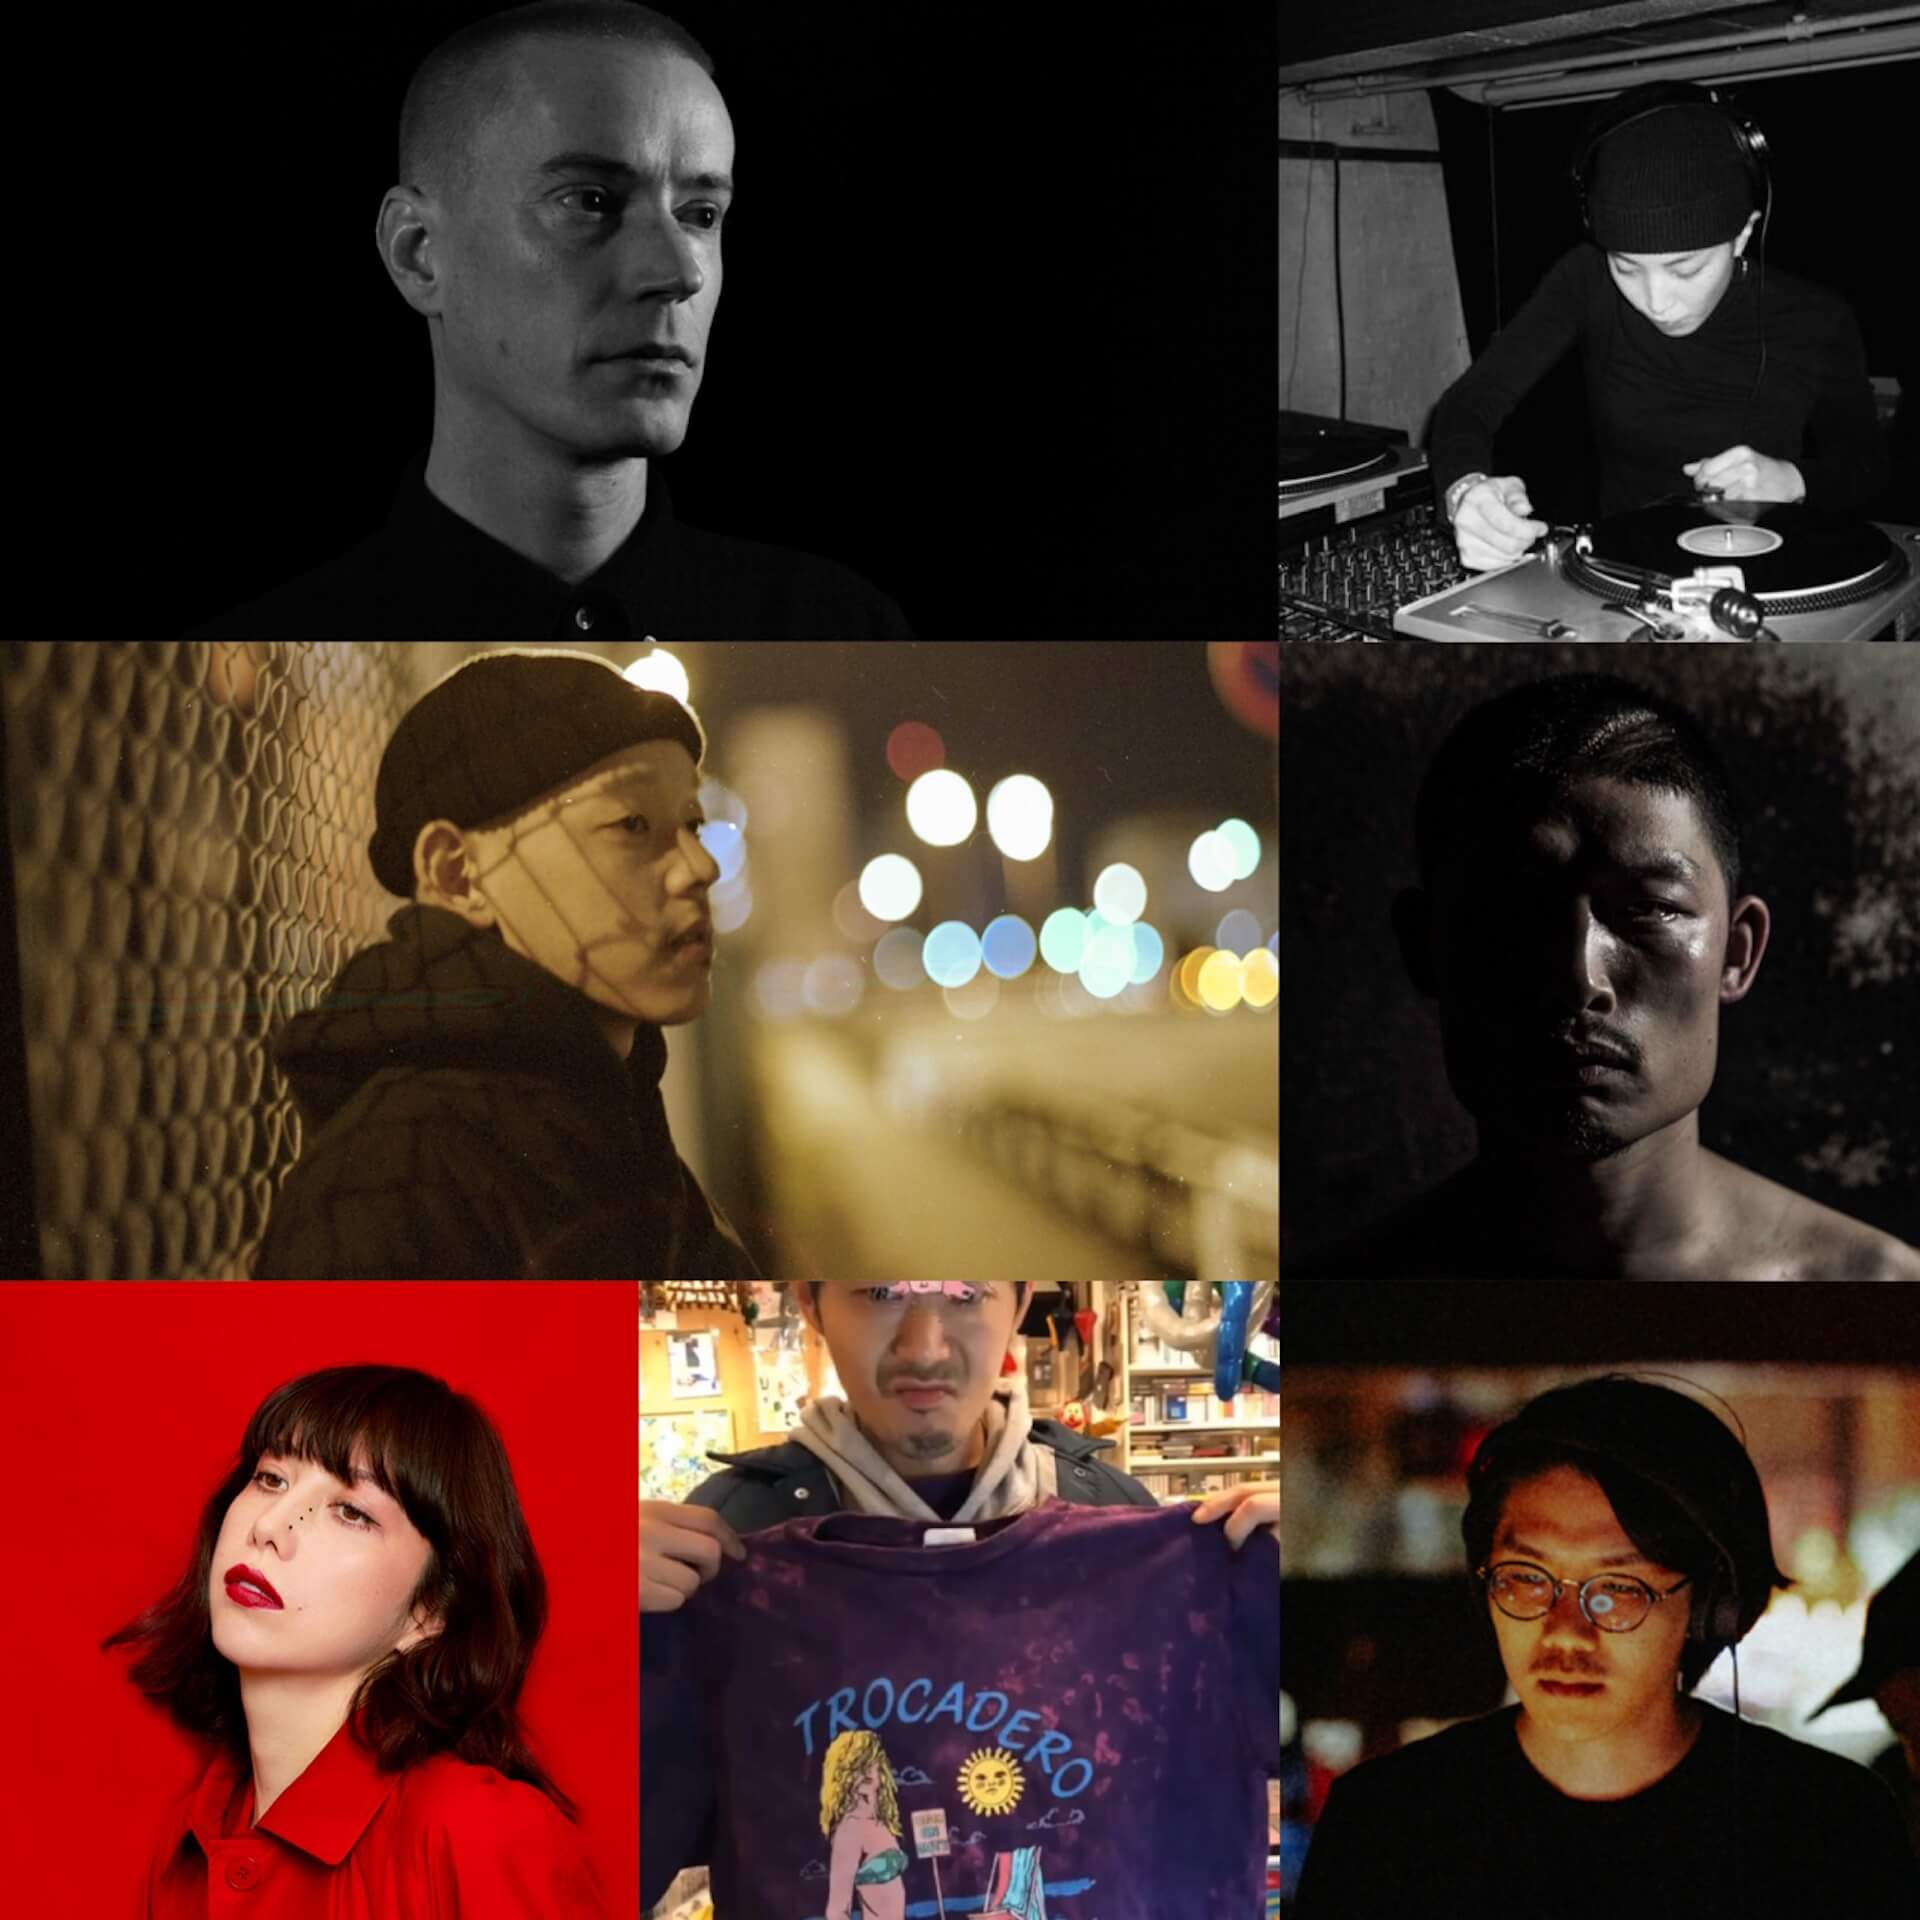 Mars89『THE DROOGS』リリースパーティのフルラインナップが明らかに!PINCH、UNDERCOVERからJUN TAKAHASHIも登場 mu200120_mars89_thedroogs_lineup_02